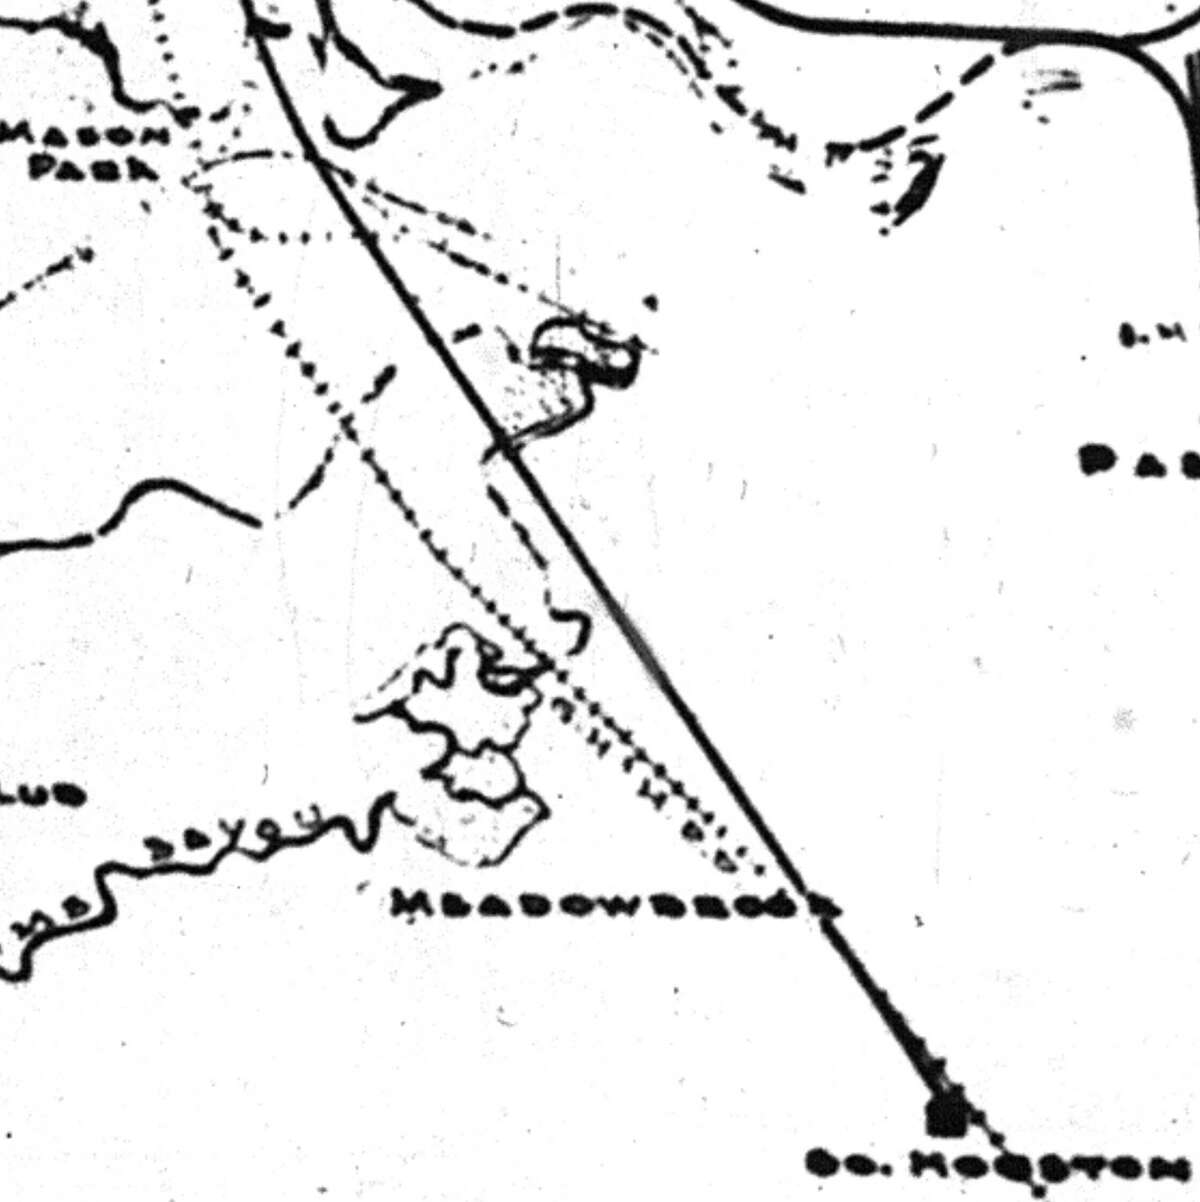 South Houston line